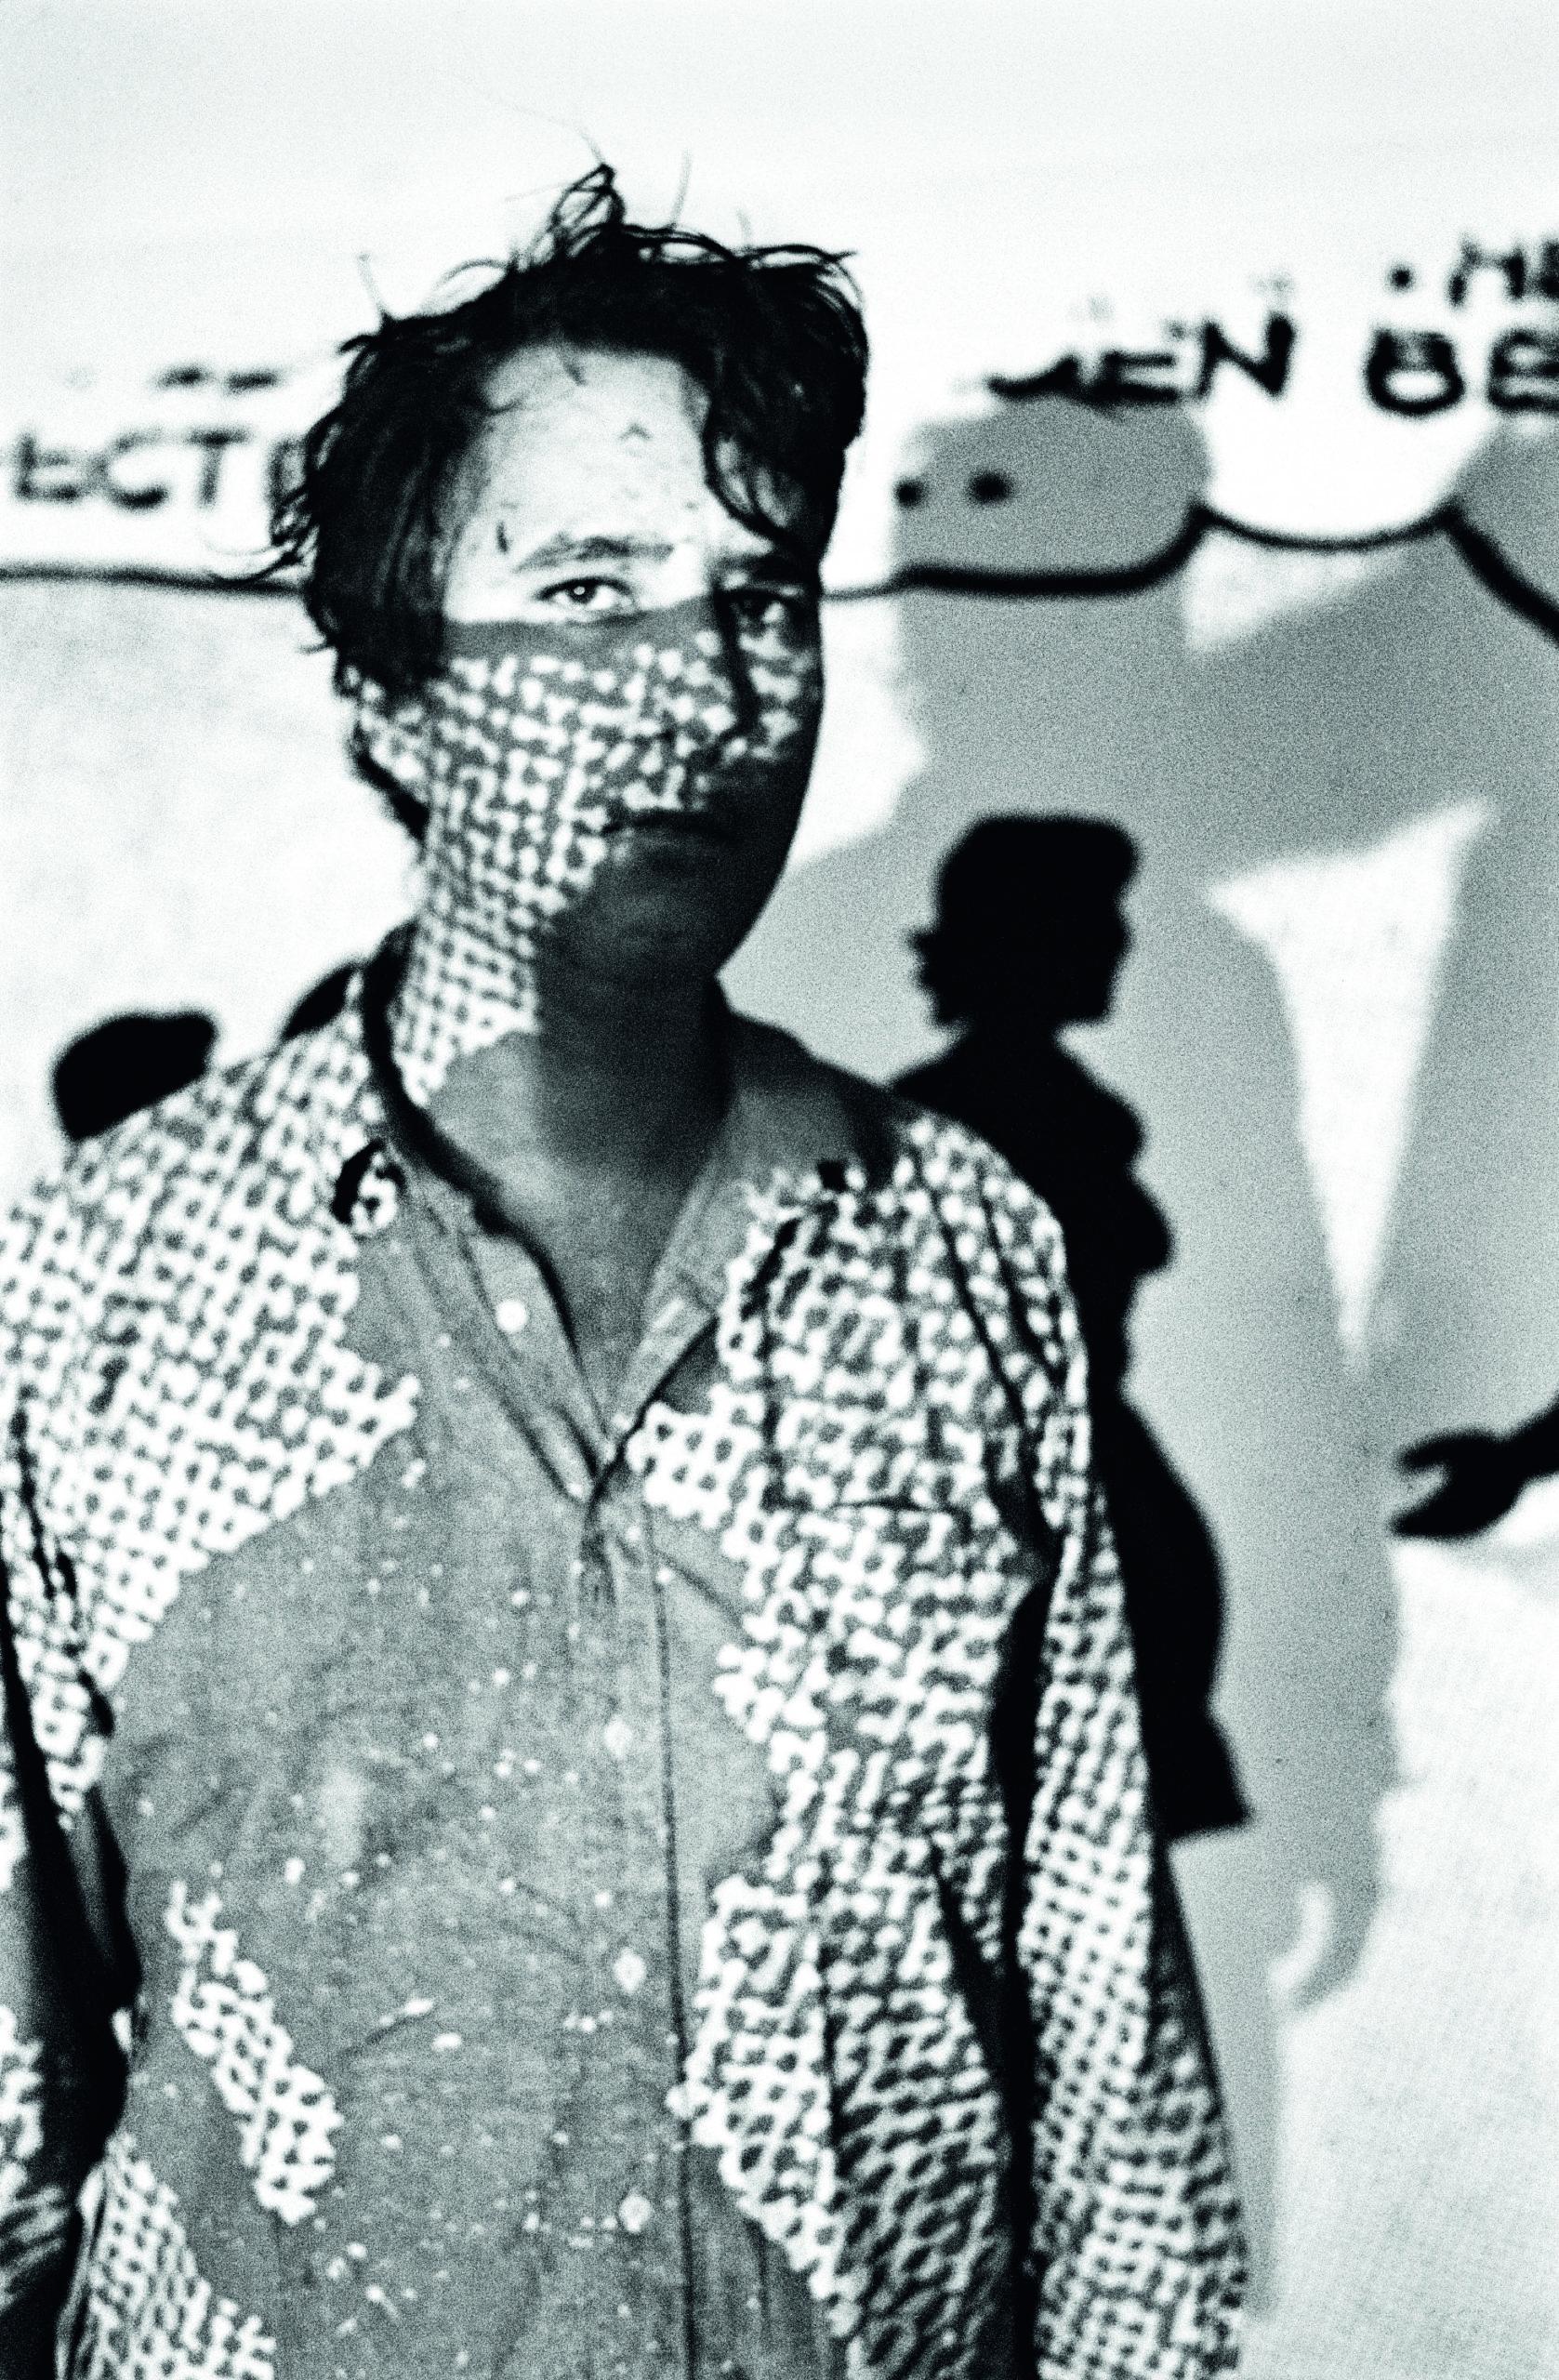 "Andrea Stappert "" Raymond Pettibon."" Berlin 1998 Sammlung Wemhöner"